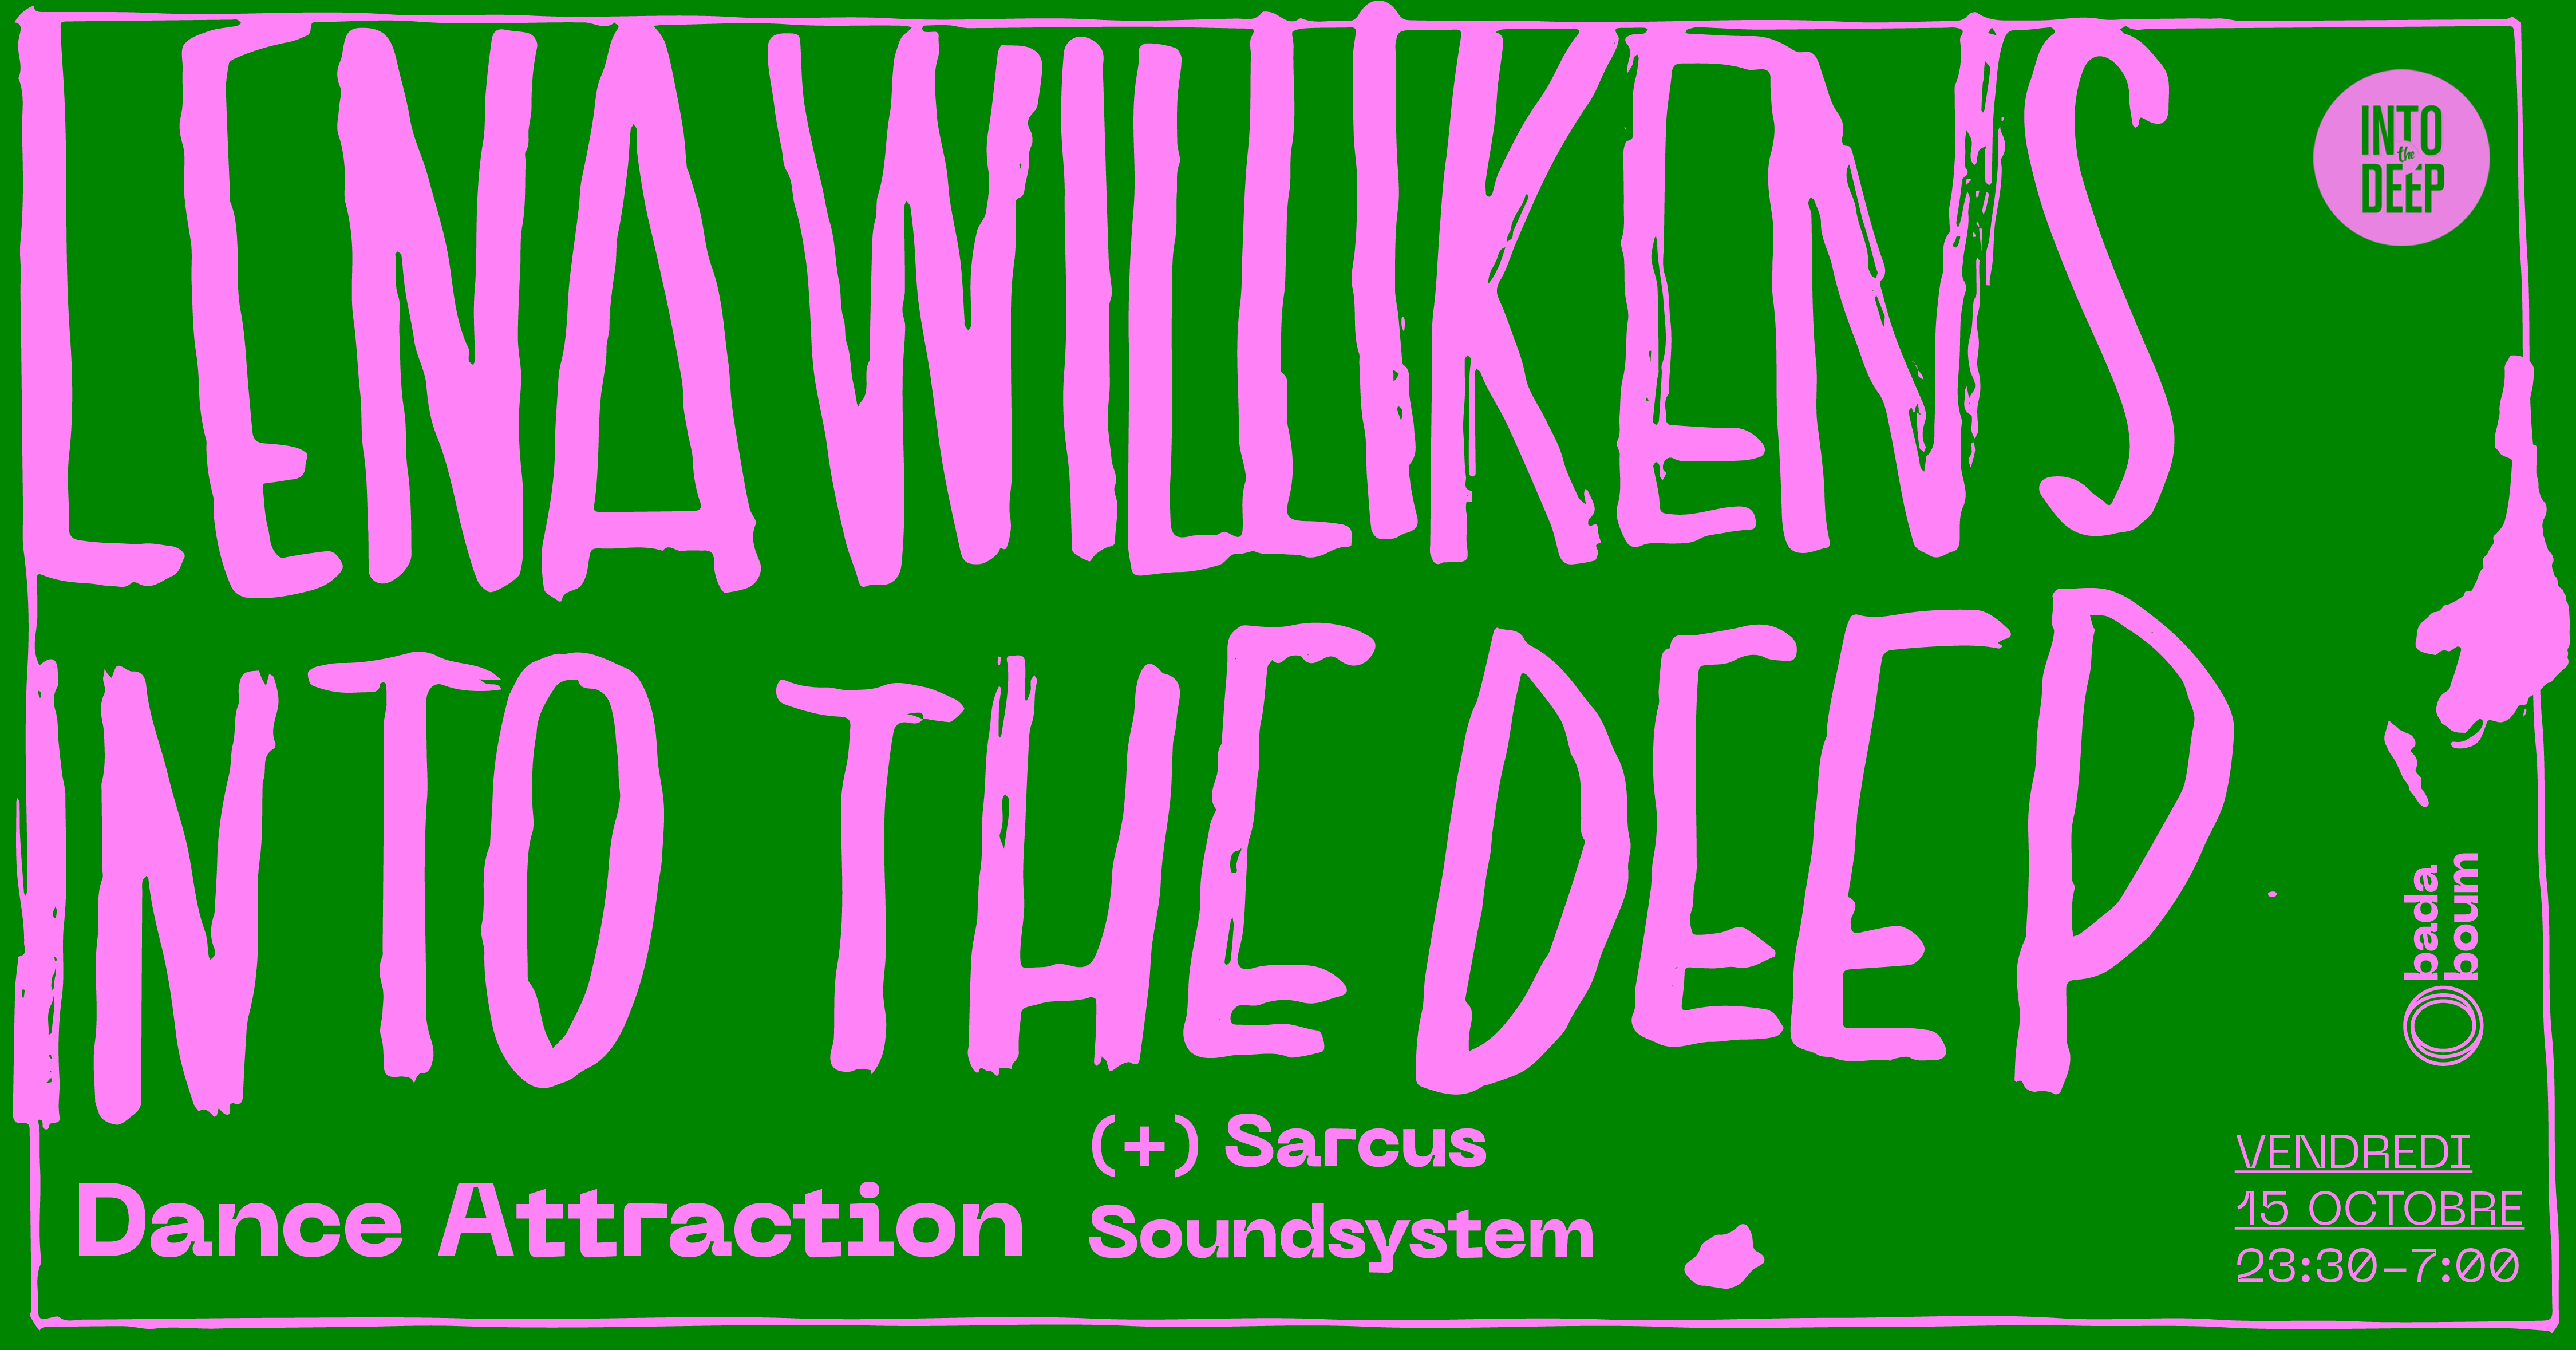 Badaboum Club : Lena Willikens, Into The Deep, Sarcus Soundsystem